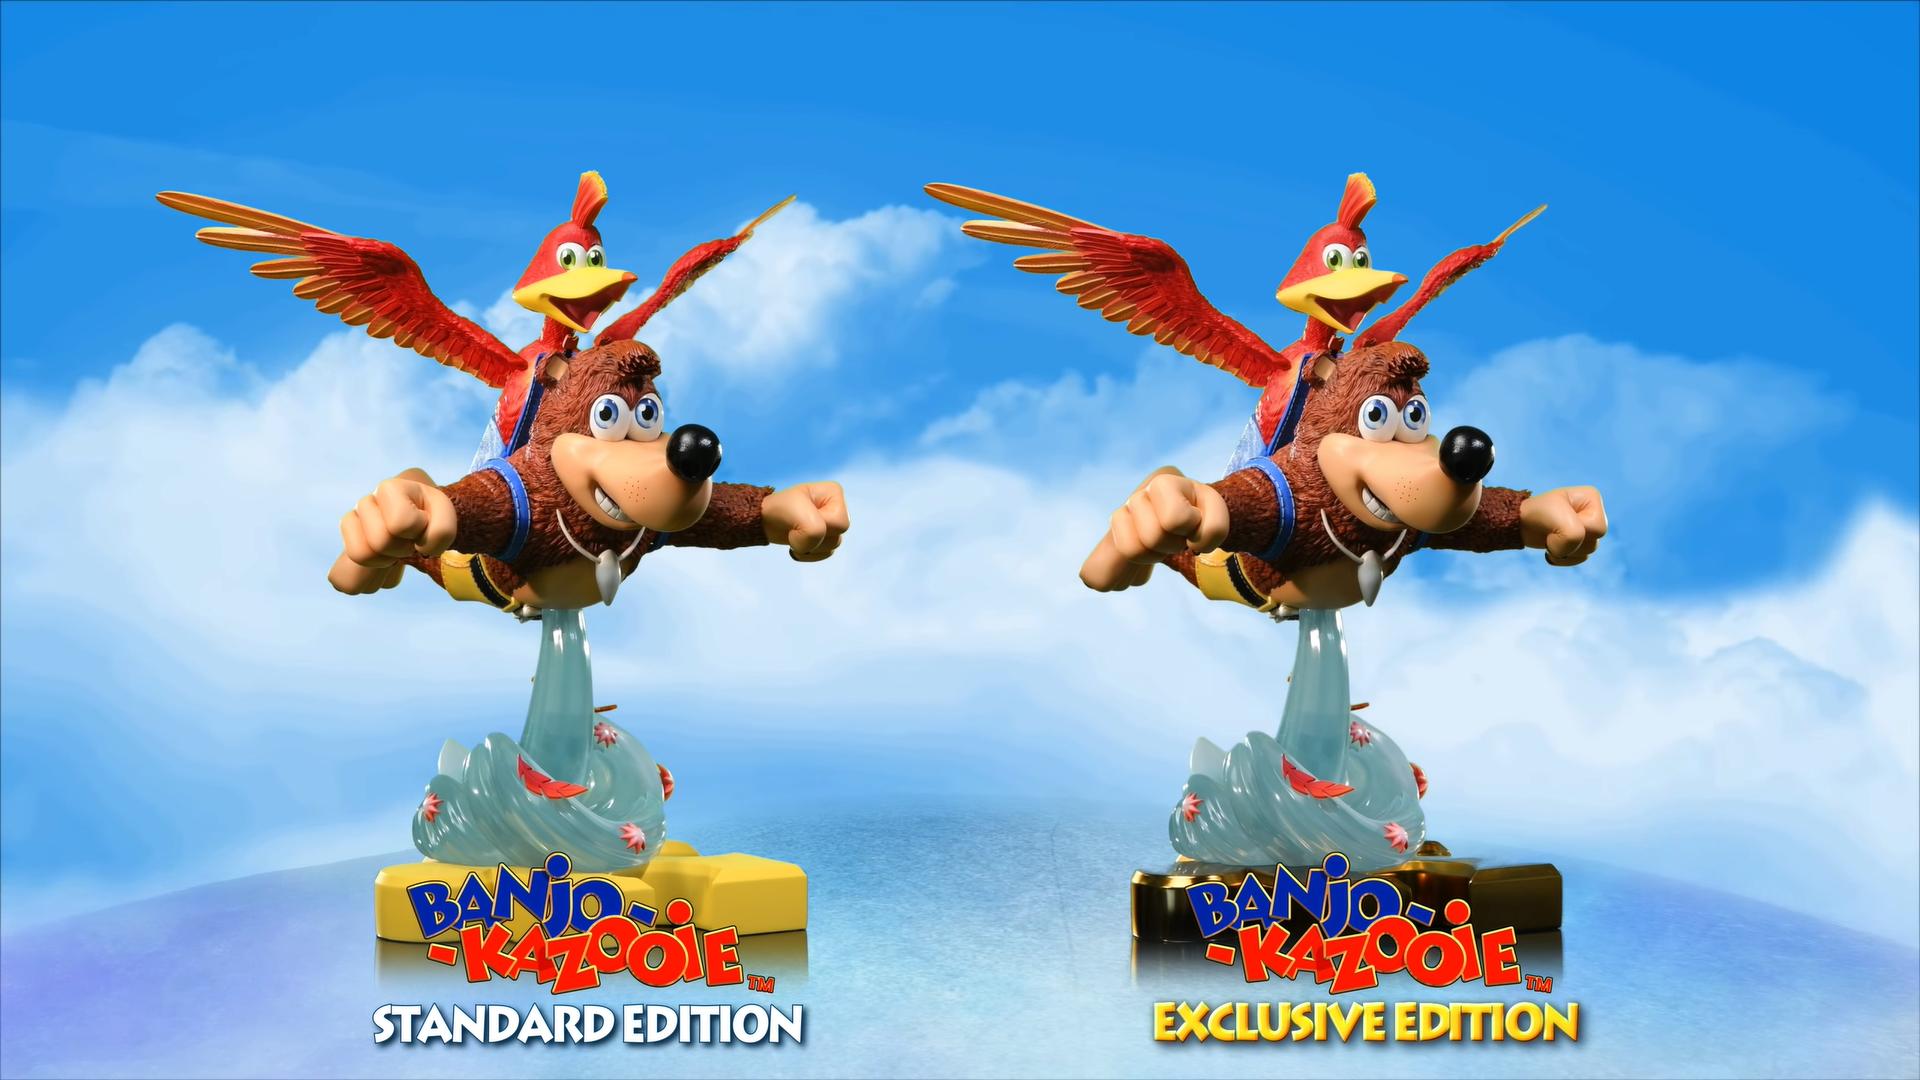 First 4 Figures Banjo-Kazooie™ series